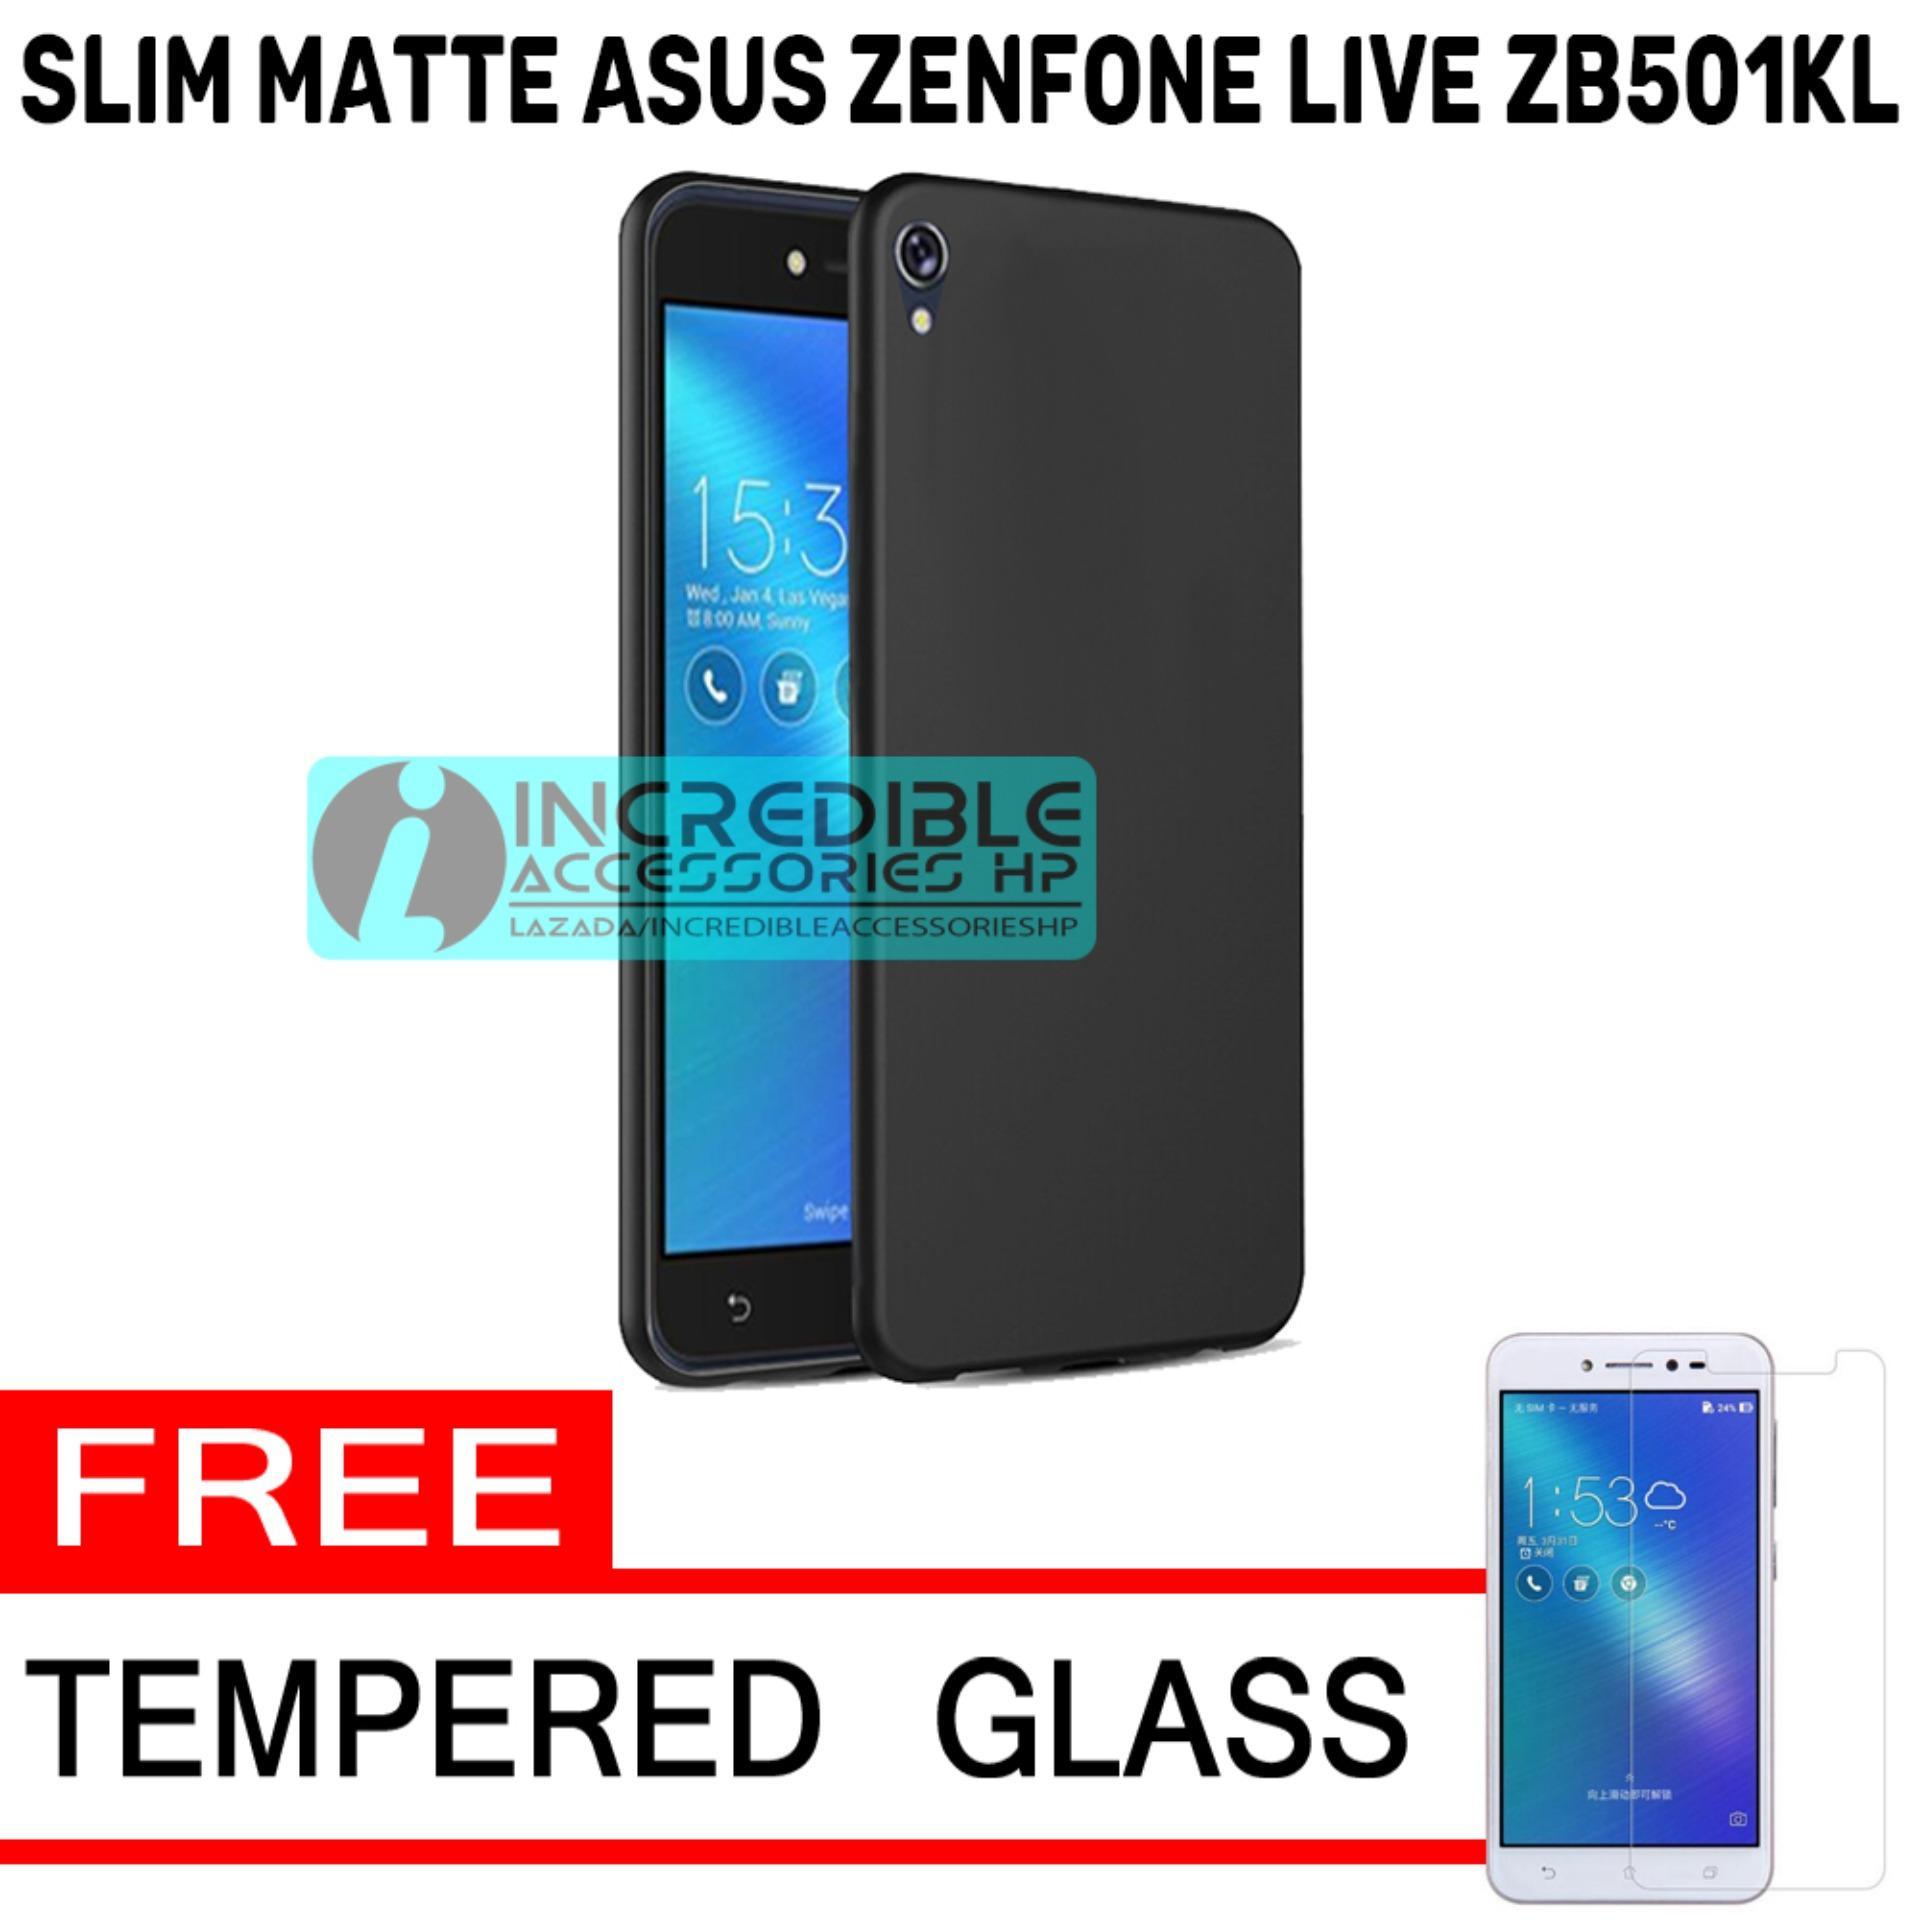 Case Slim Black Matte Baby Skin Softcase Premium Matte for Asus Zenfone Live ZB501KL - Black + Free